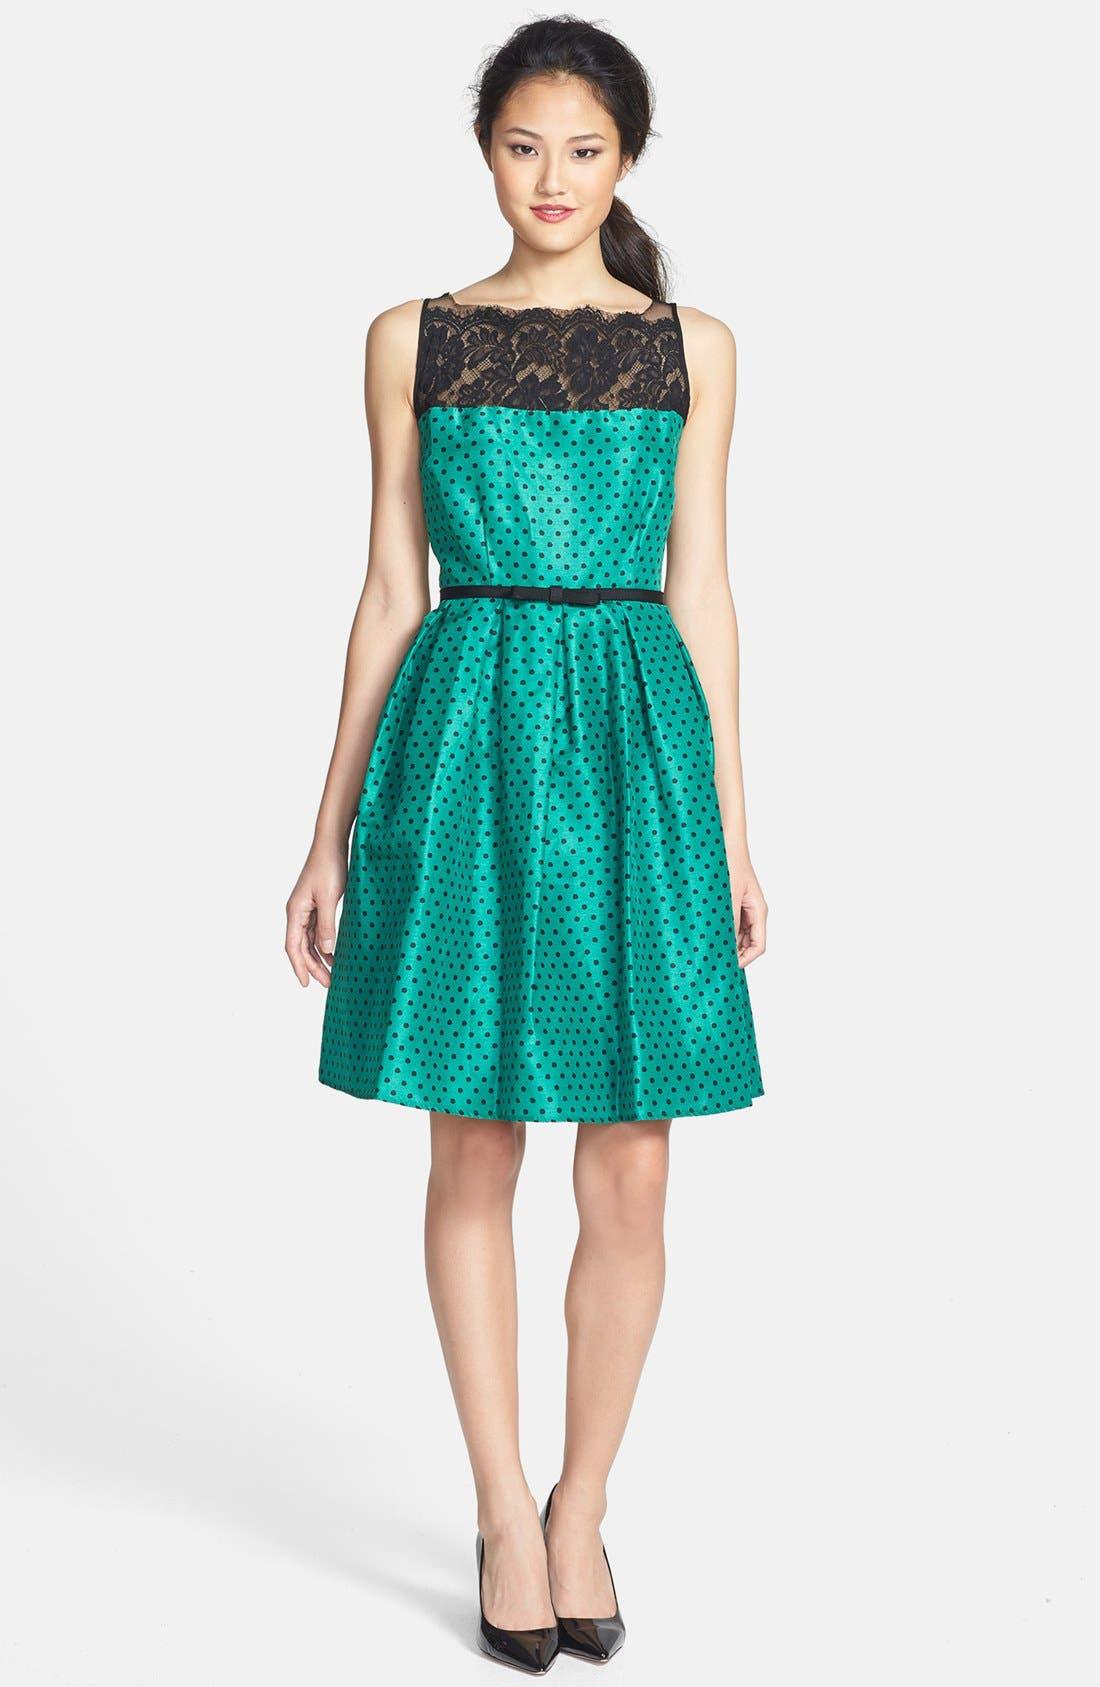 Alternate Image 1 Selected - Taylor Dresses Polka Dot Taffeta Fit & Flare Dress